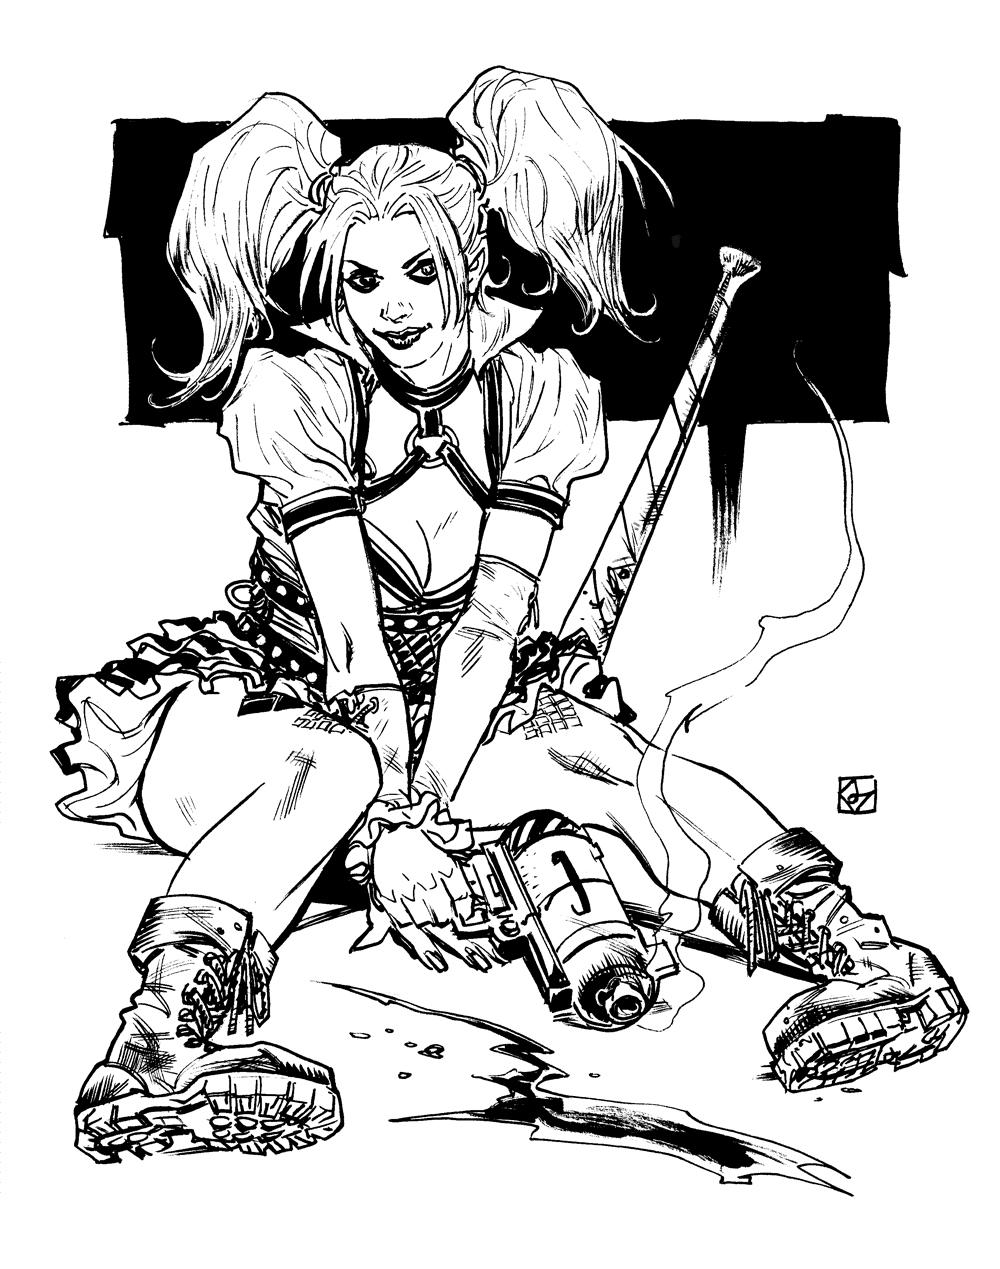 Harley Quinn from Batman Arkham Knight by deankotz